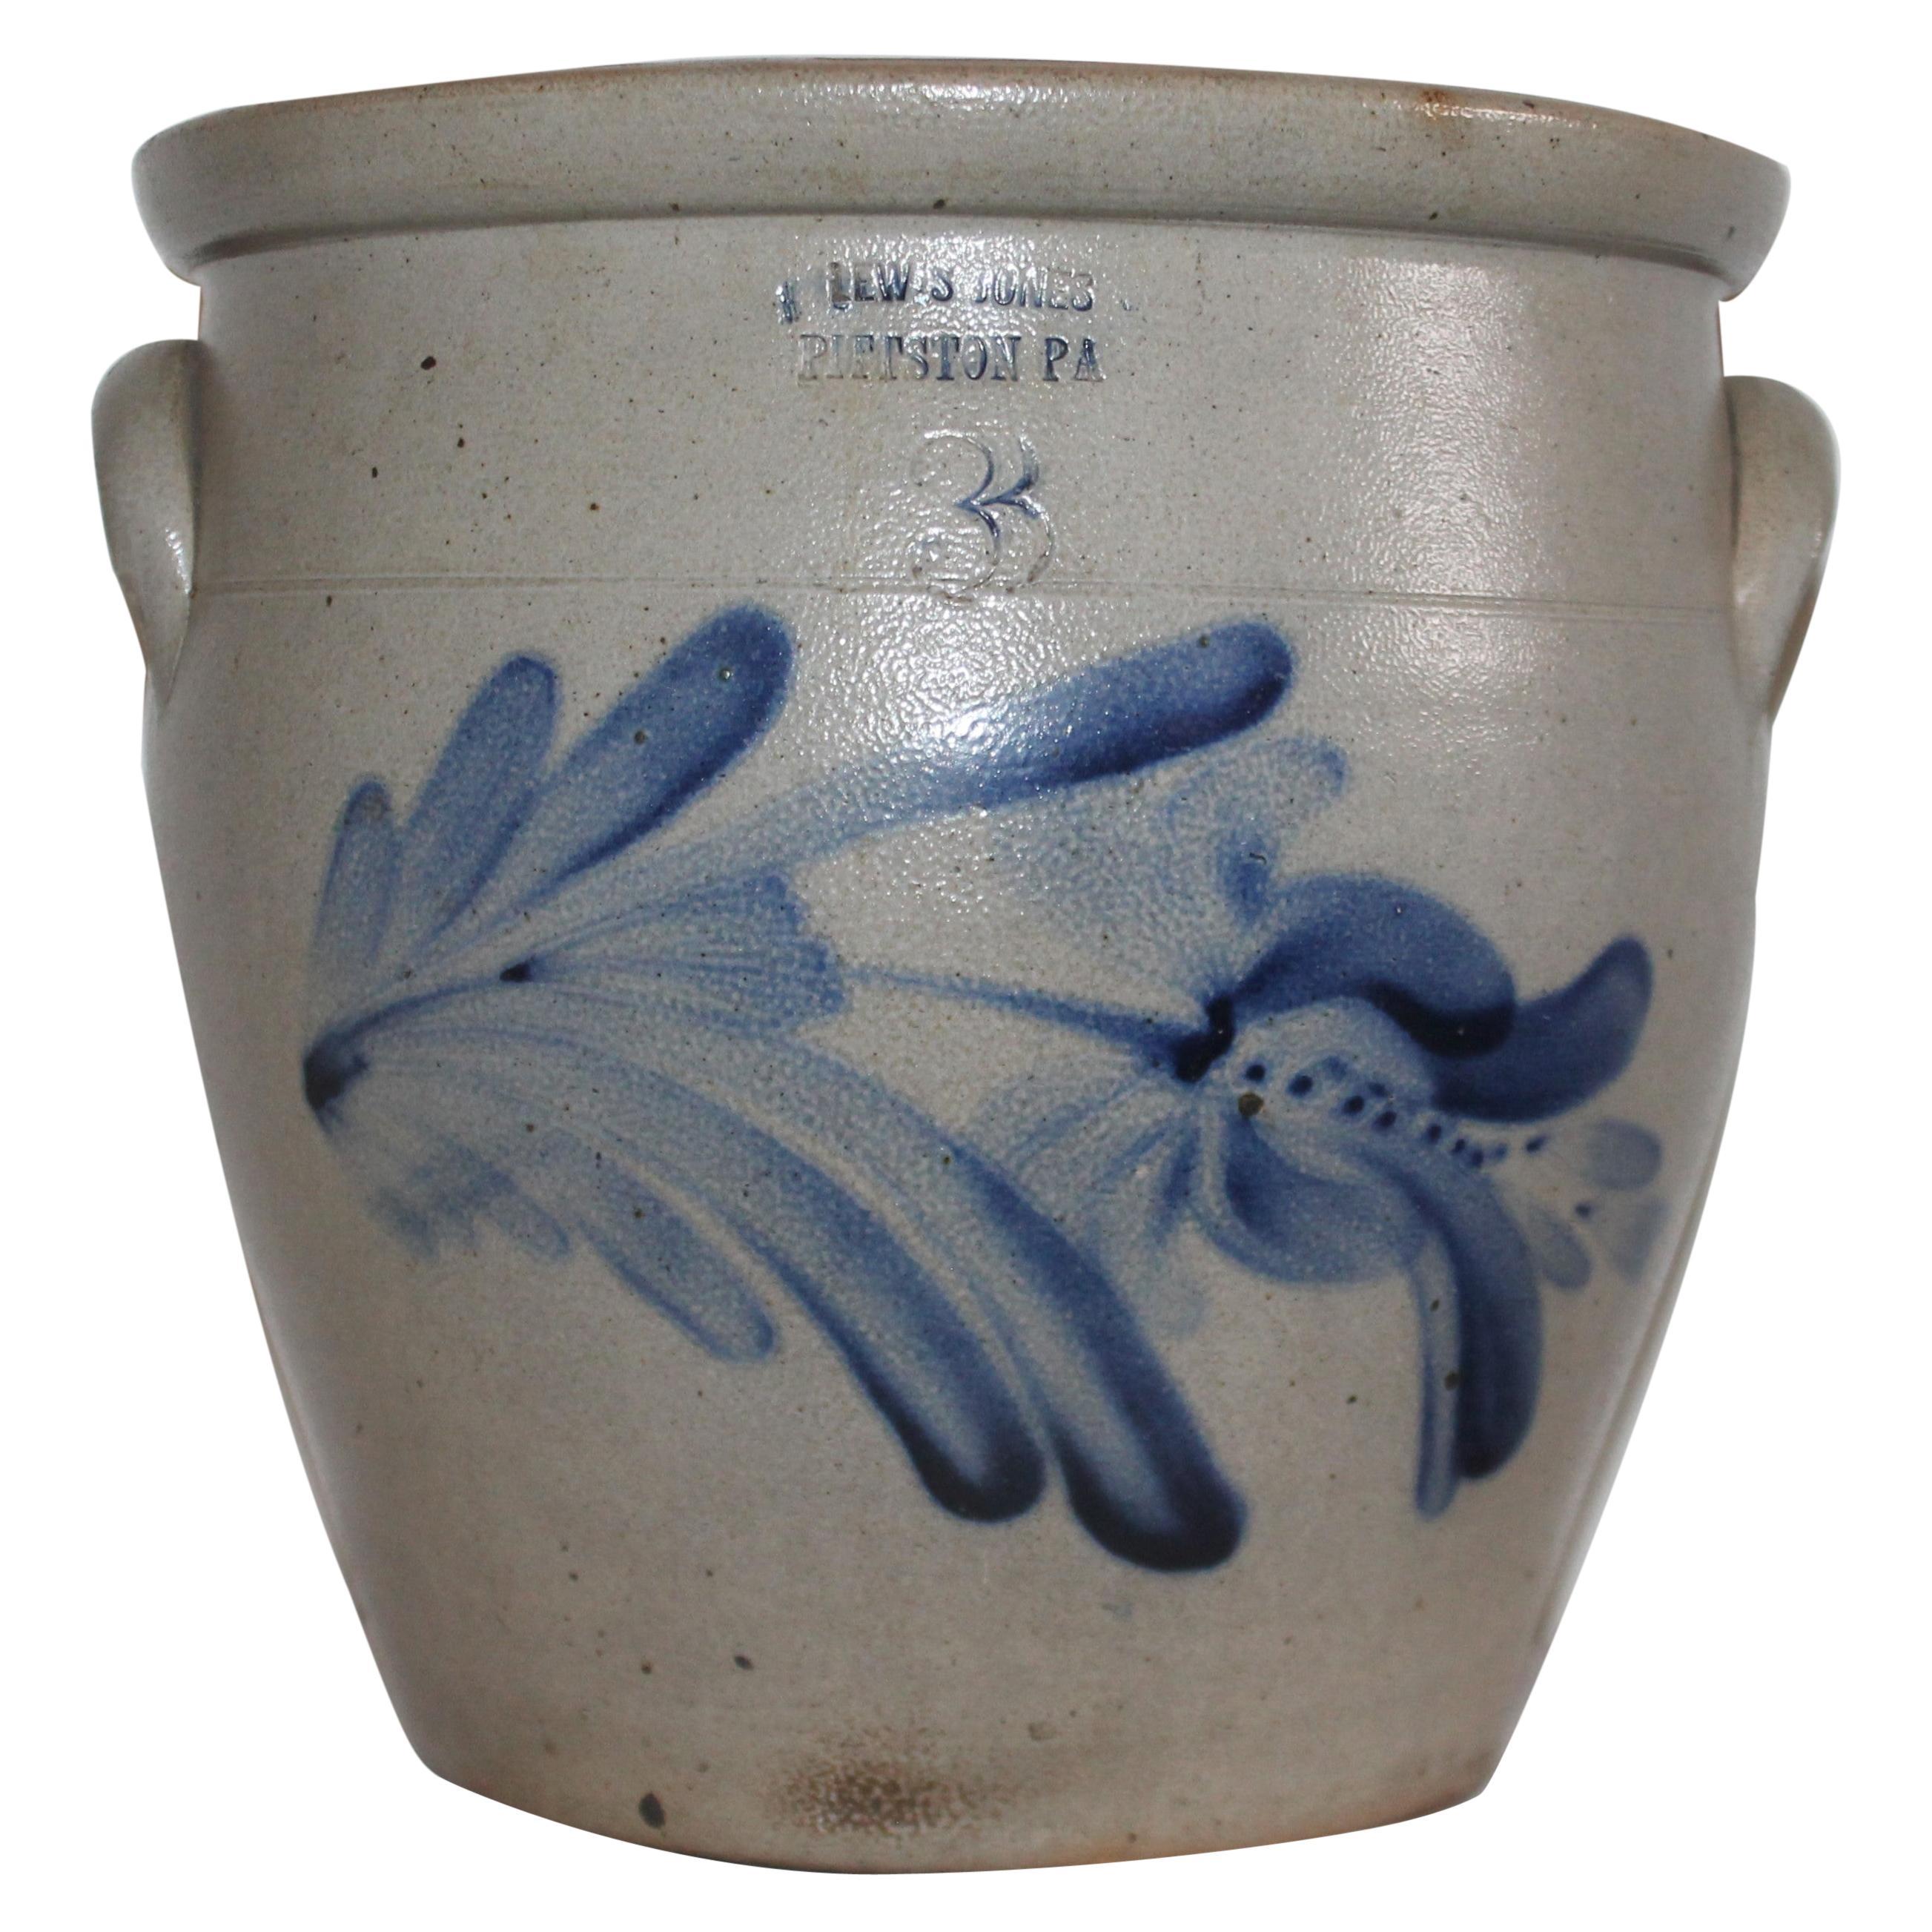 19th Century Lewis Jones Pittston Cobalt Blue Decorated Crock